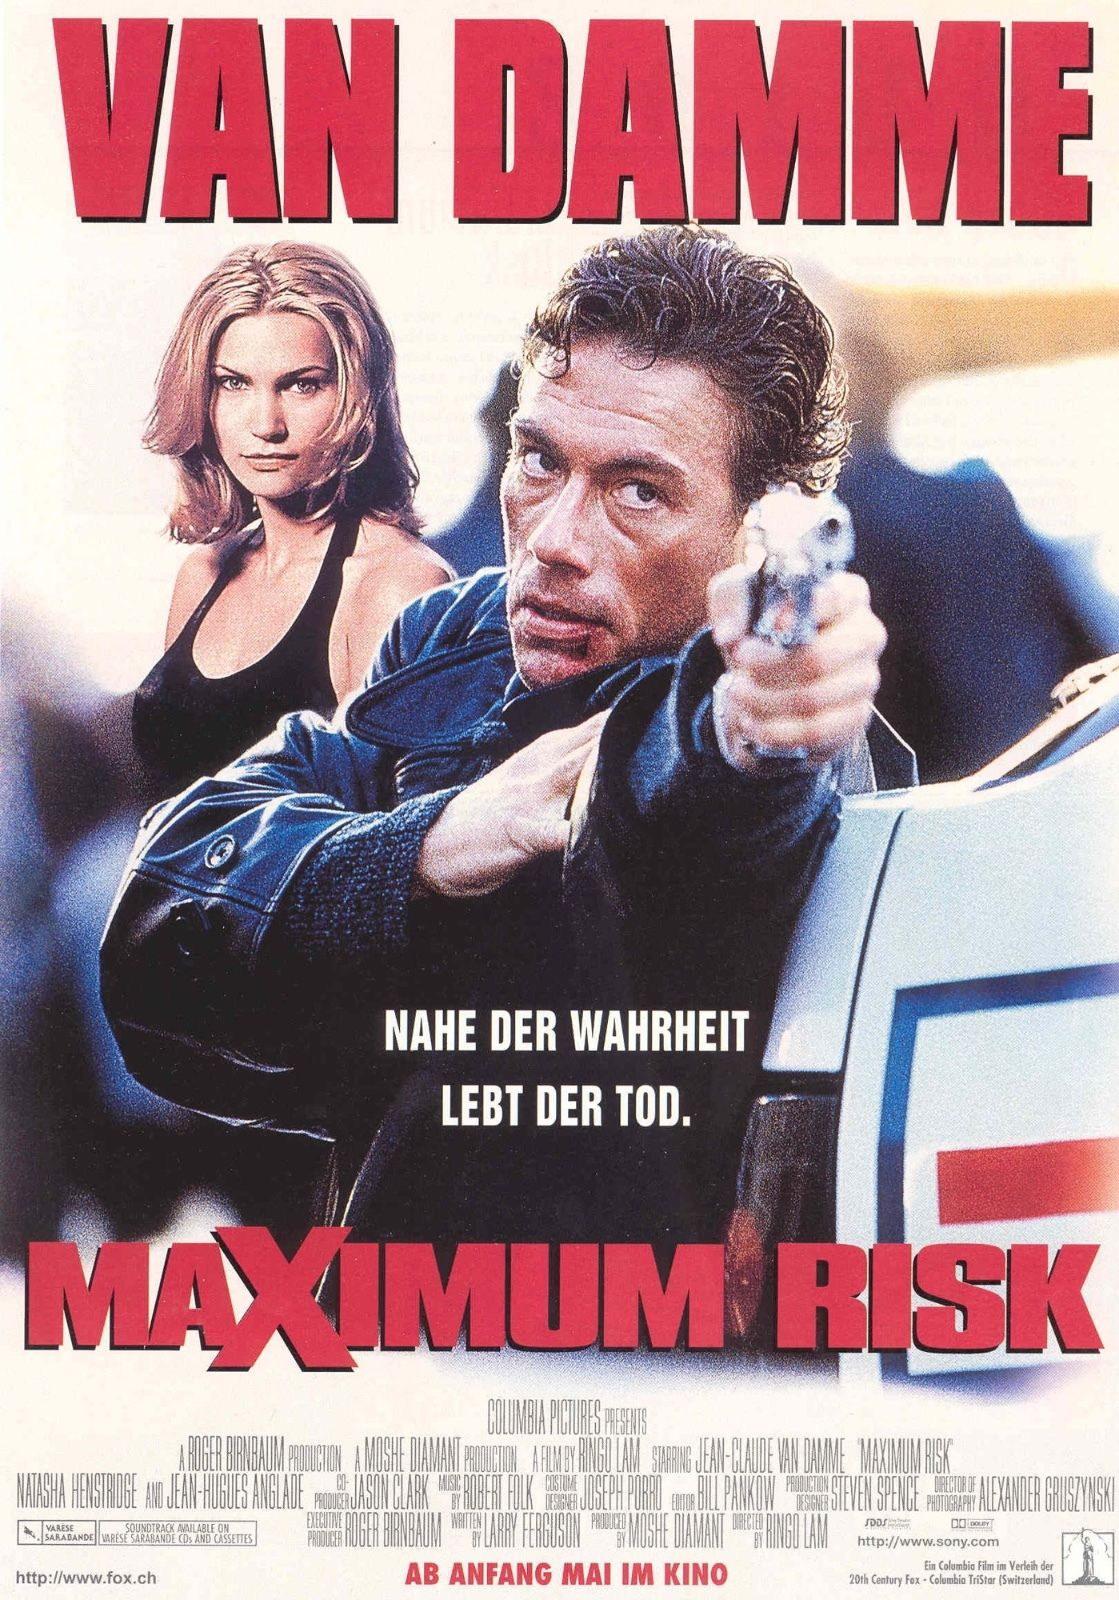 73900-Maximum-Risk-Movie-1996-Crime-Thriller-FRAMED-CANVAS-PRINT-Toile